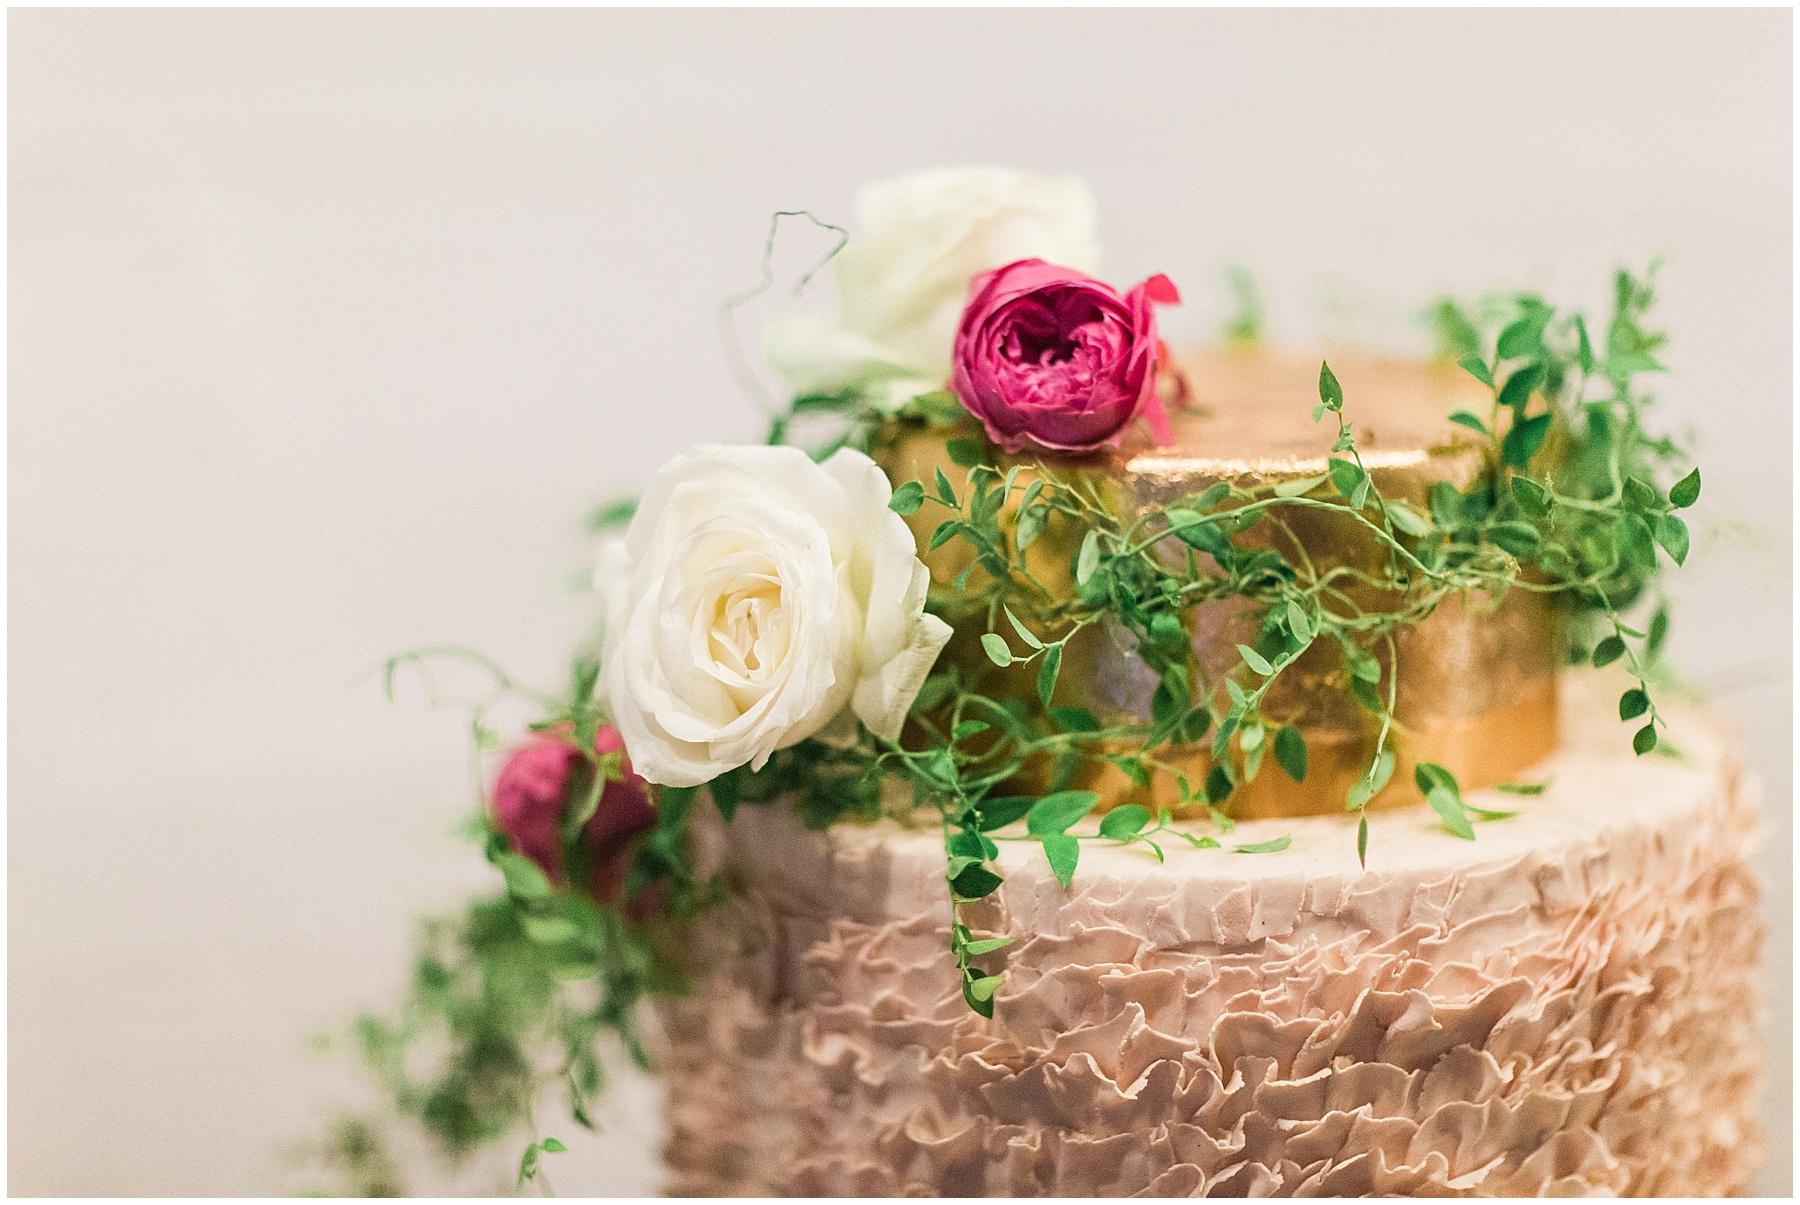 AliciaLandman_JoleneandZander_Wedding_The Pretty Blog_0413.jpg